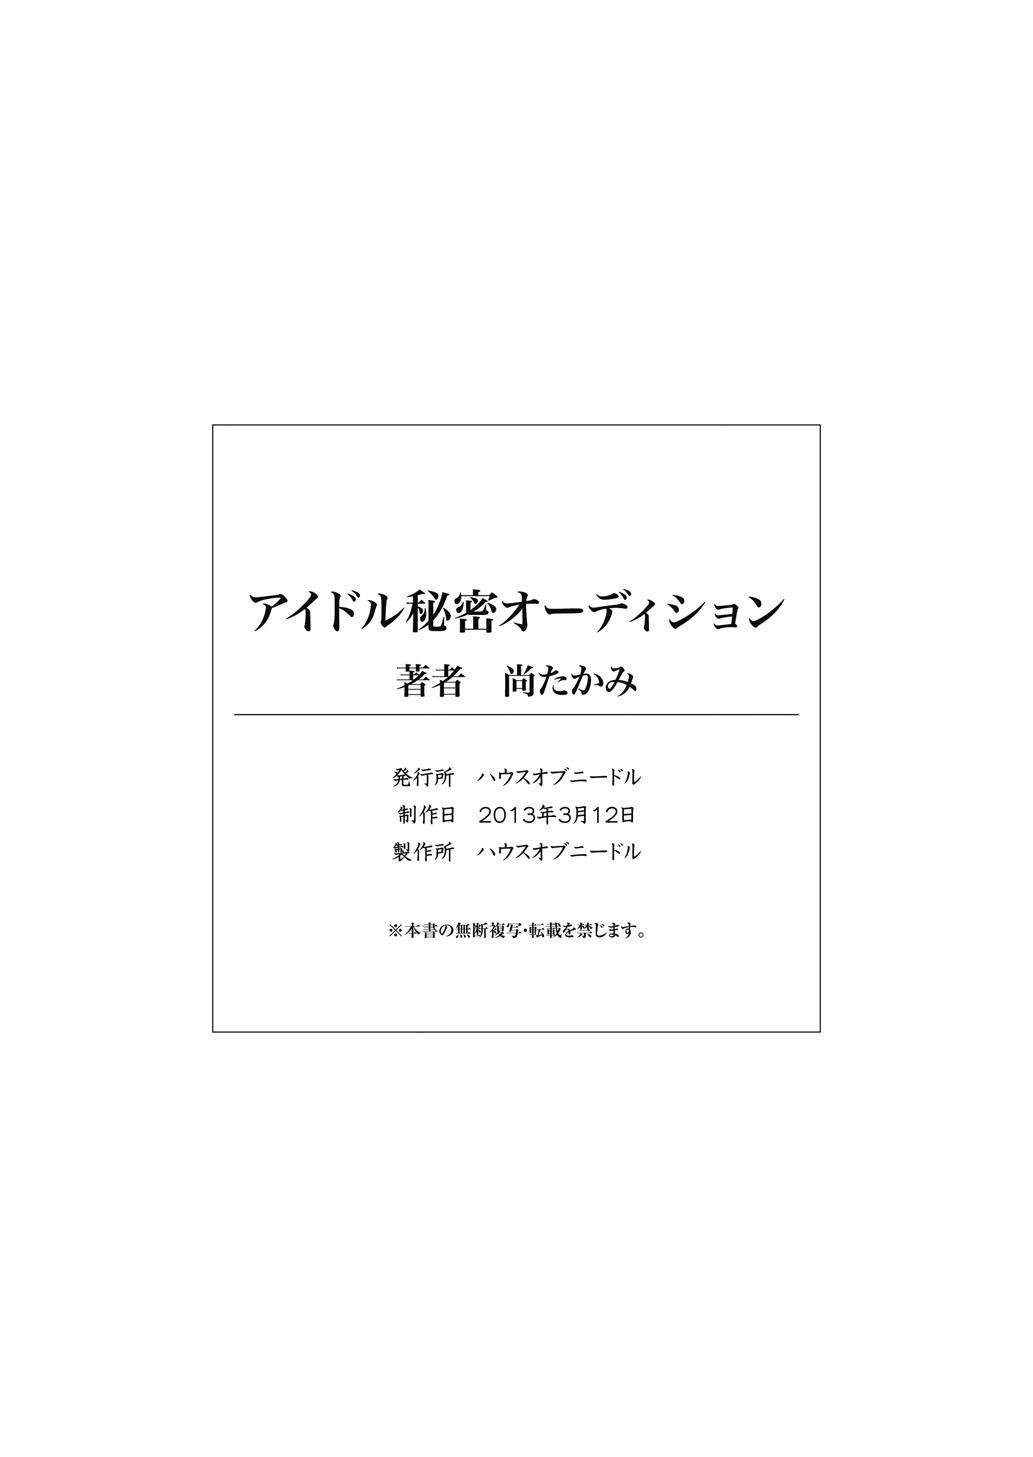 Idol Himitsu Audition 45